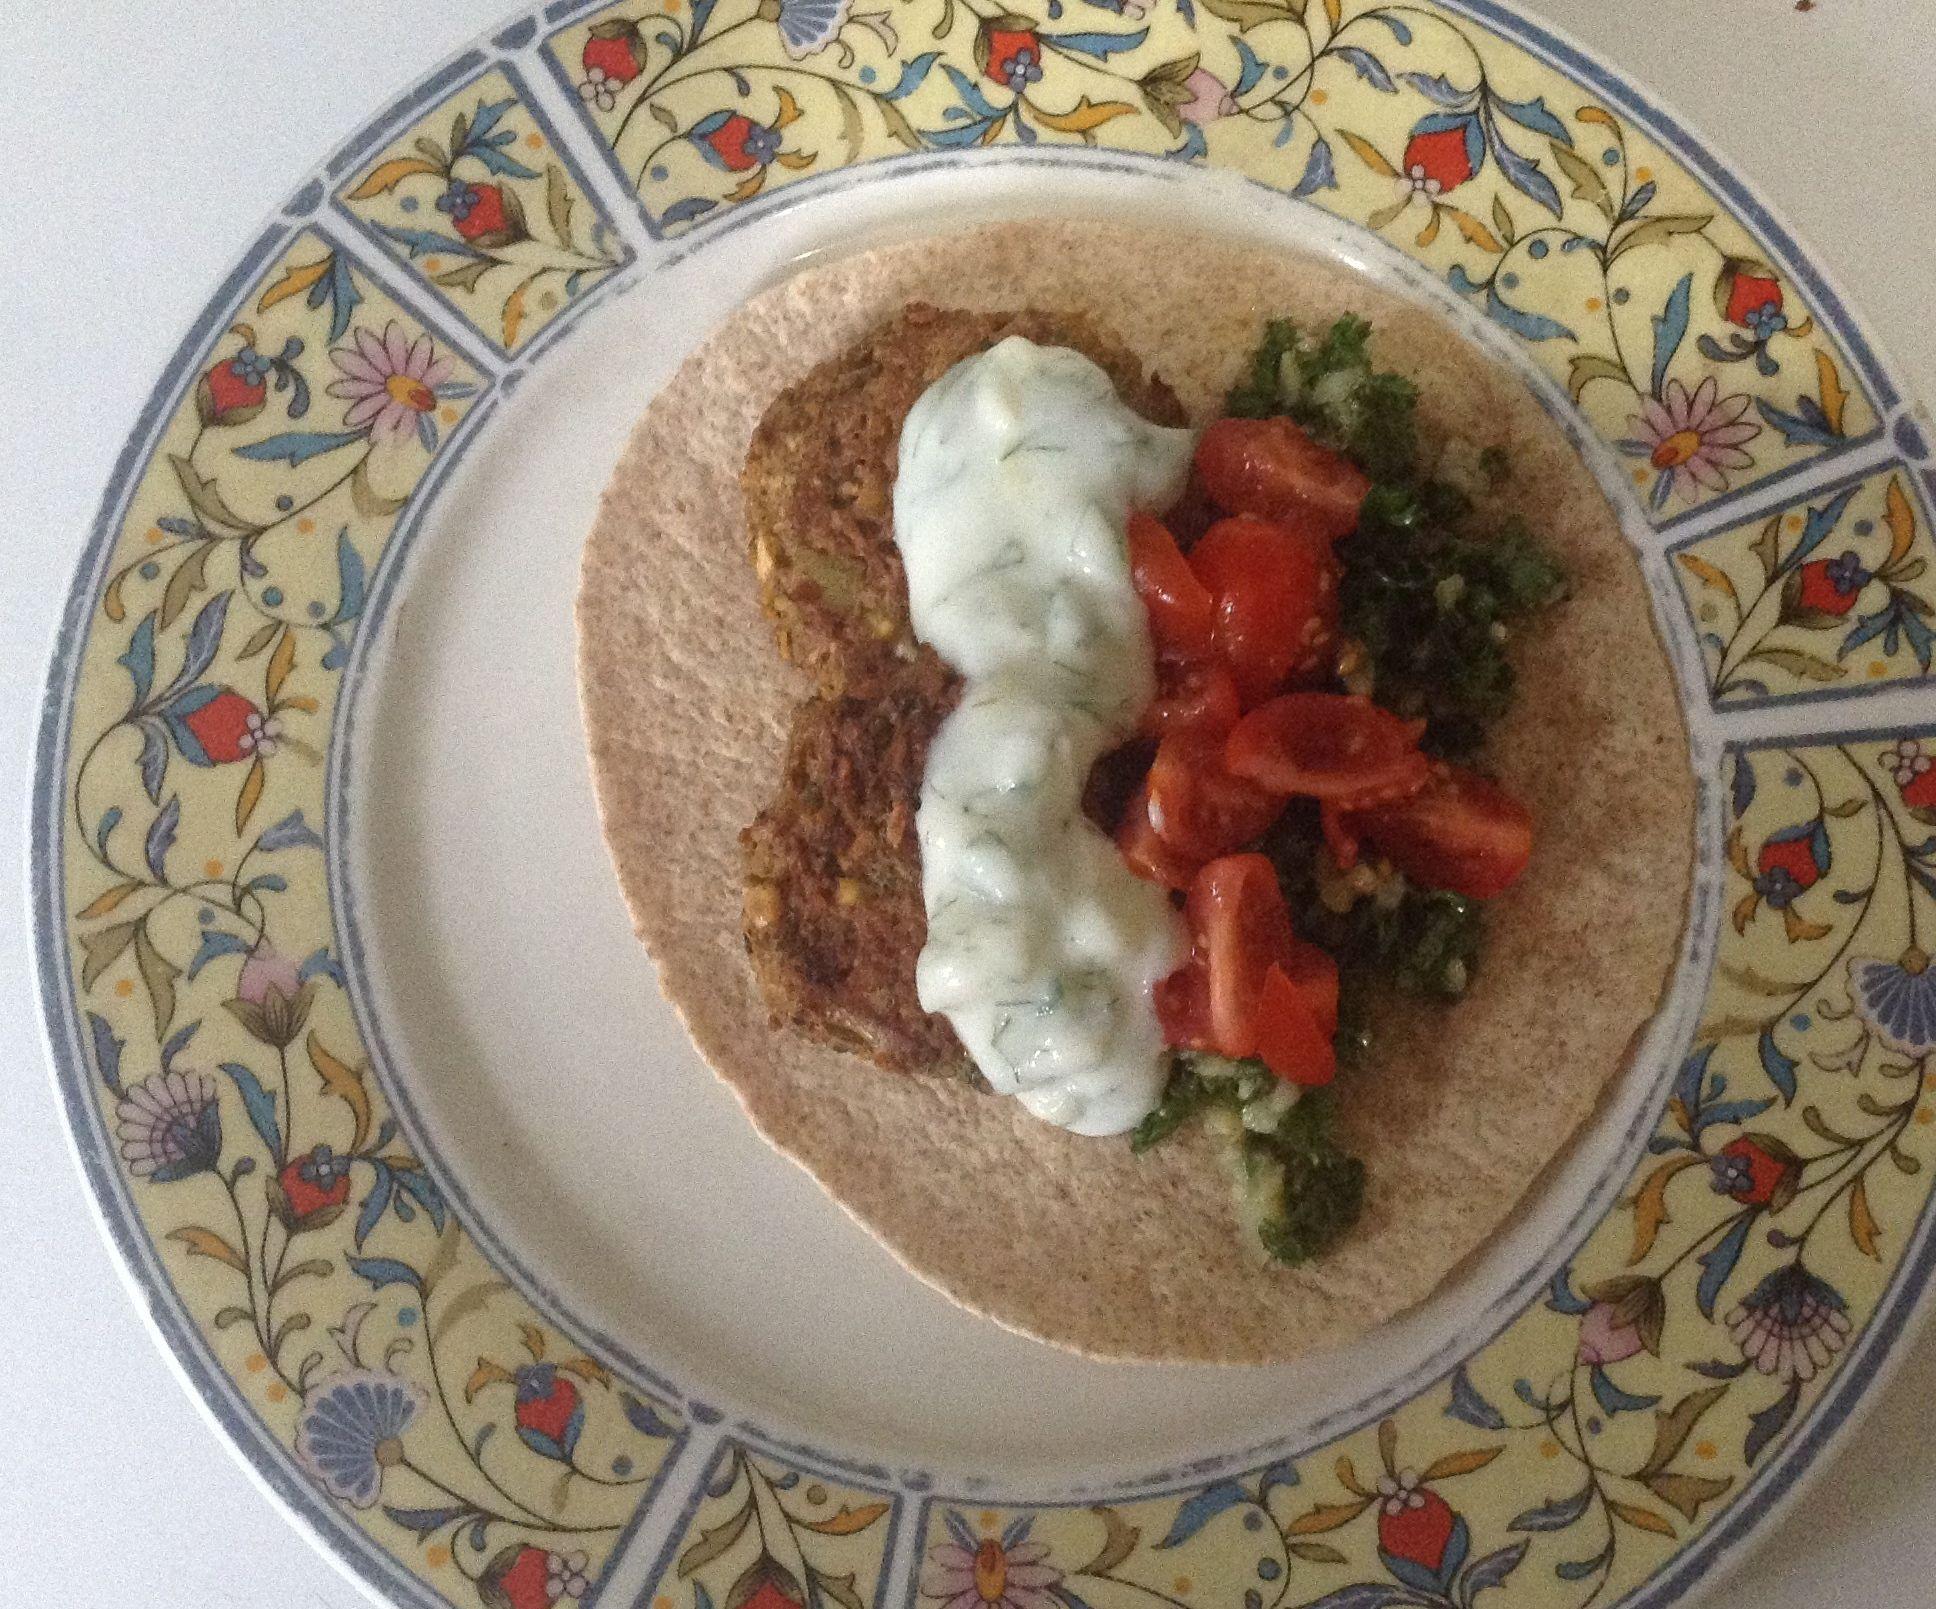 Falafel Dinner, No Food Processor